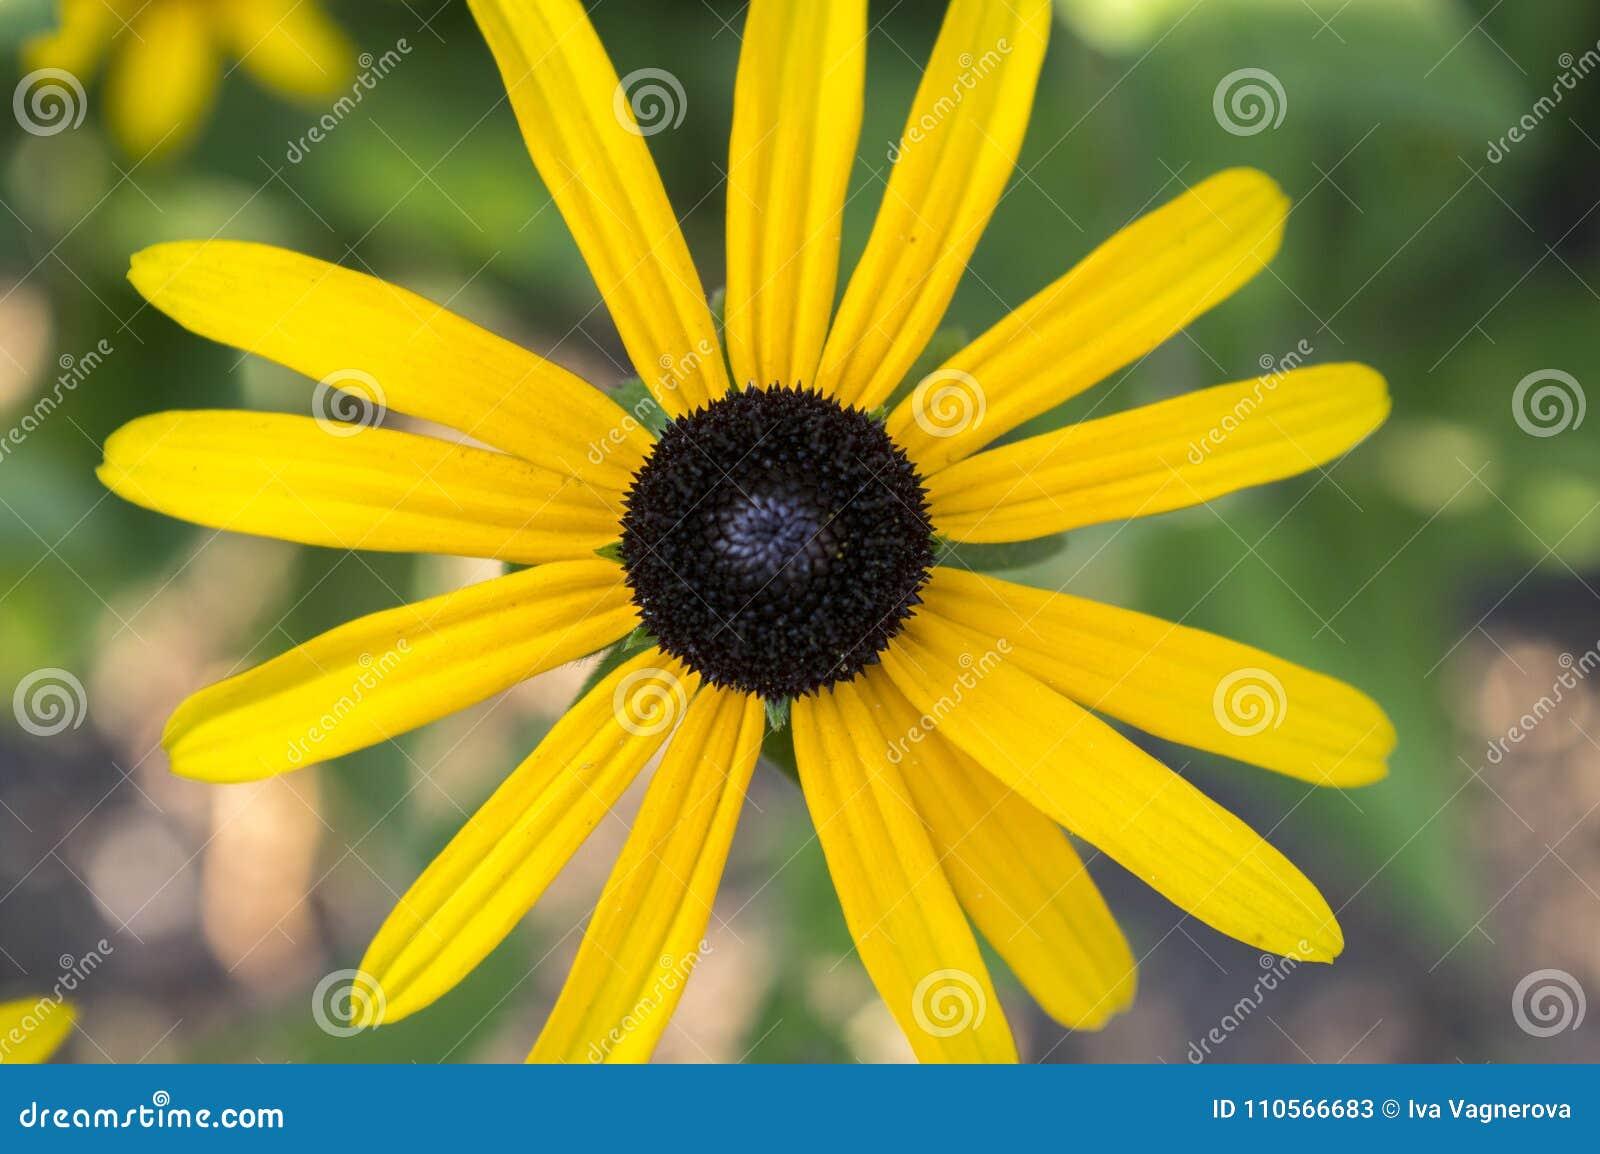 Rudbeckia hirta yellow flower with black brown centre in bloom download rudbeckia hirta yellow flower with black brown centre in bloom black eyed susan in mightylinksfo